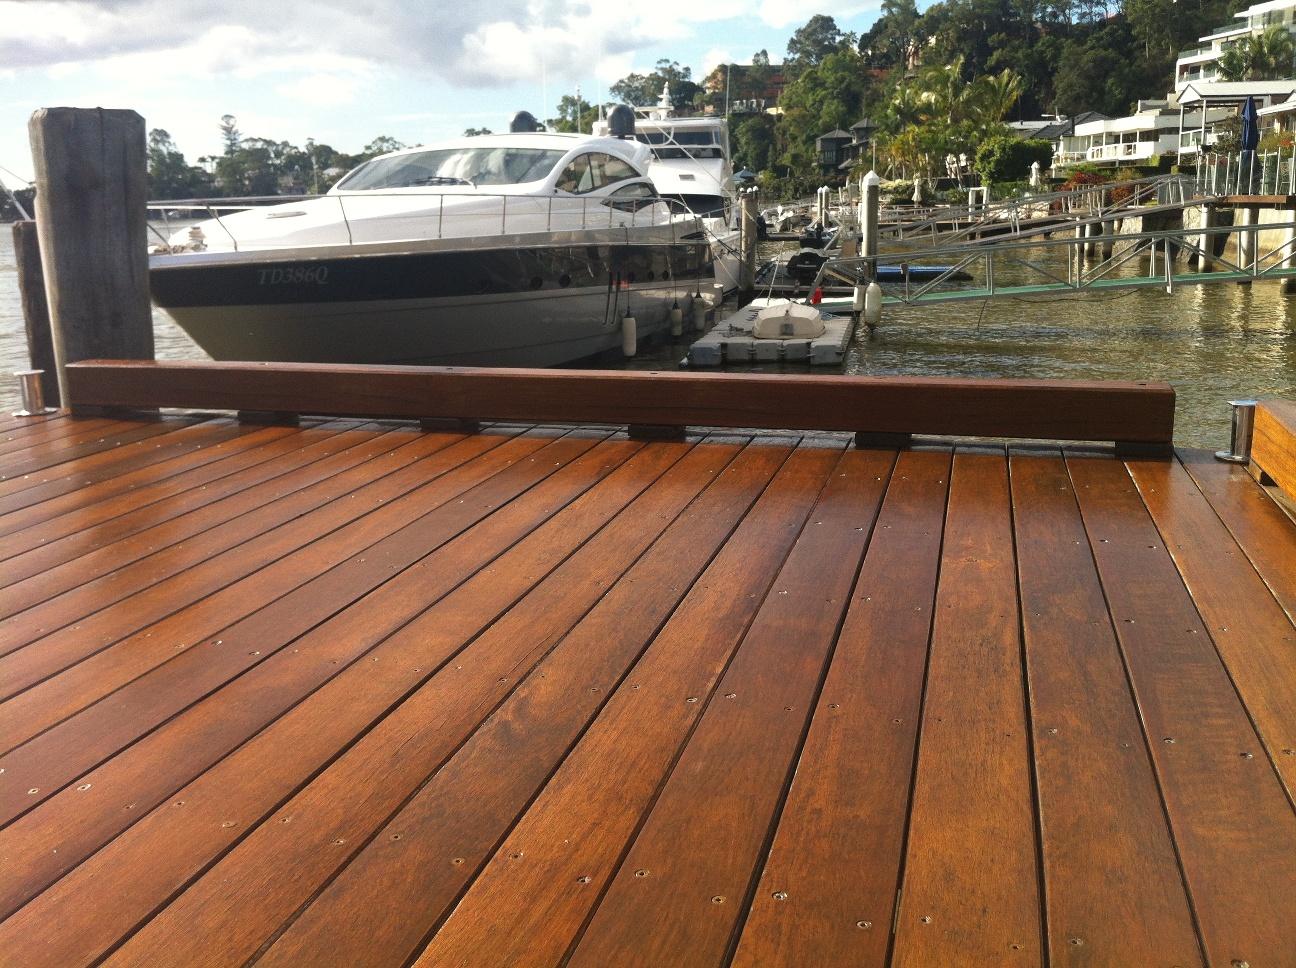 Affordable Floors Brisbane Floor Sanding, Sanding Timber Decks, Oiling Decks and Recoating Timber Decks